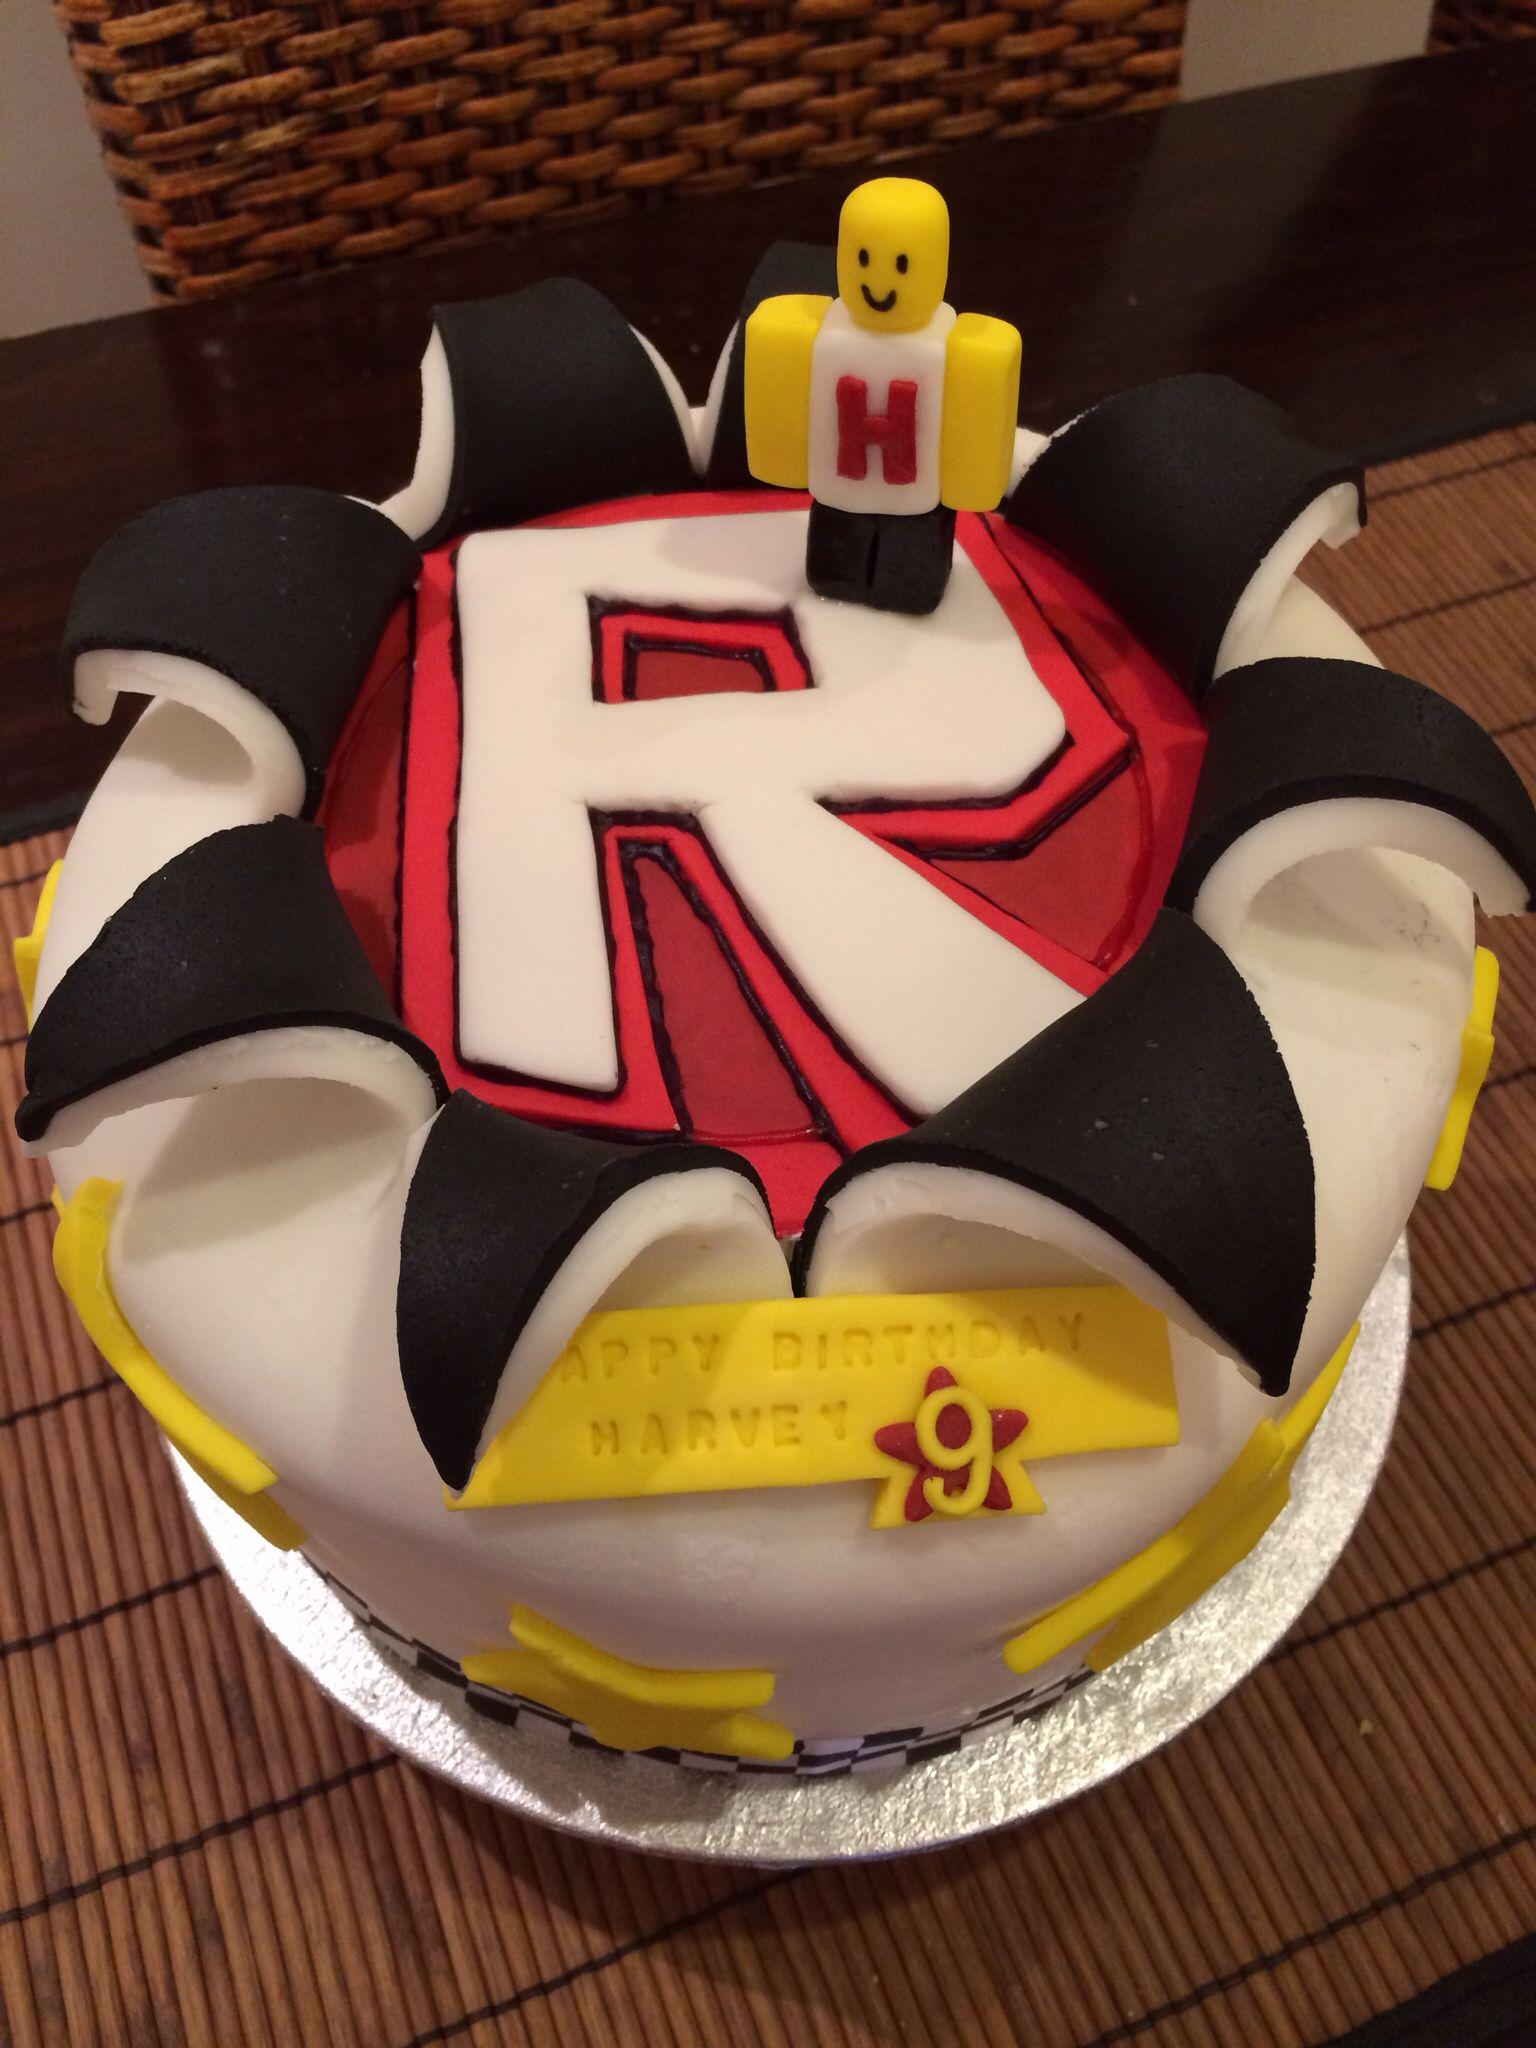 Roblox birthday cake  Four layers of vanilla sponge with